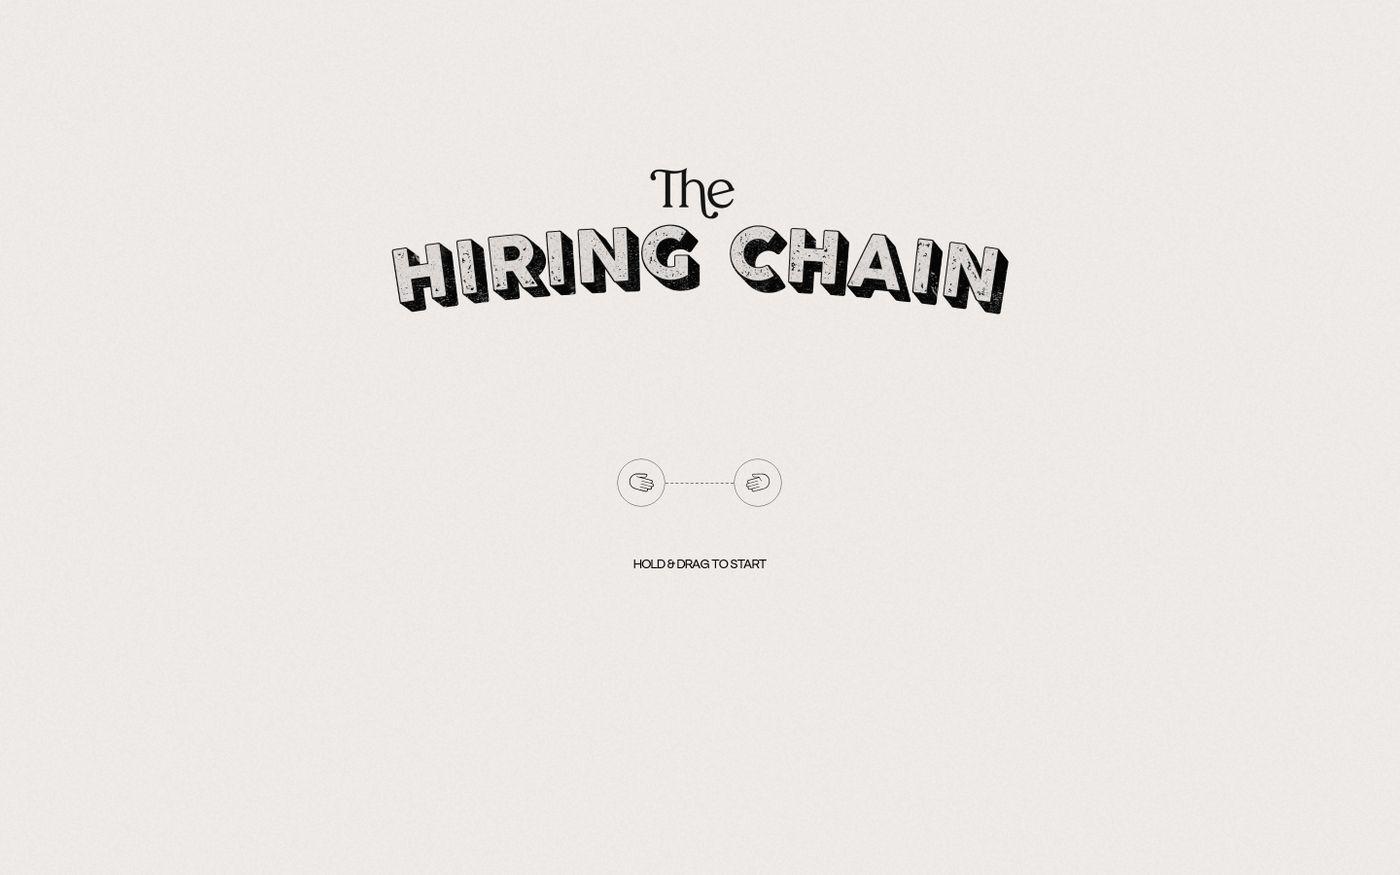 Screenshot of The hiring chain website